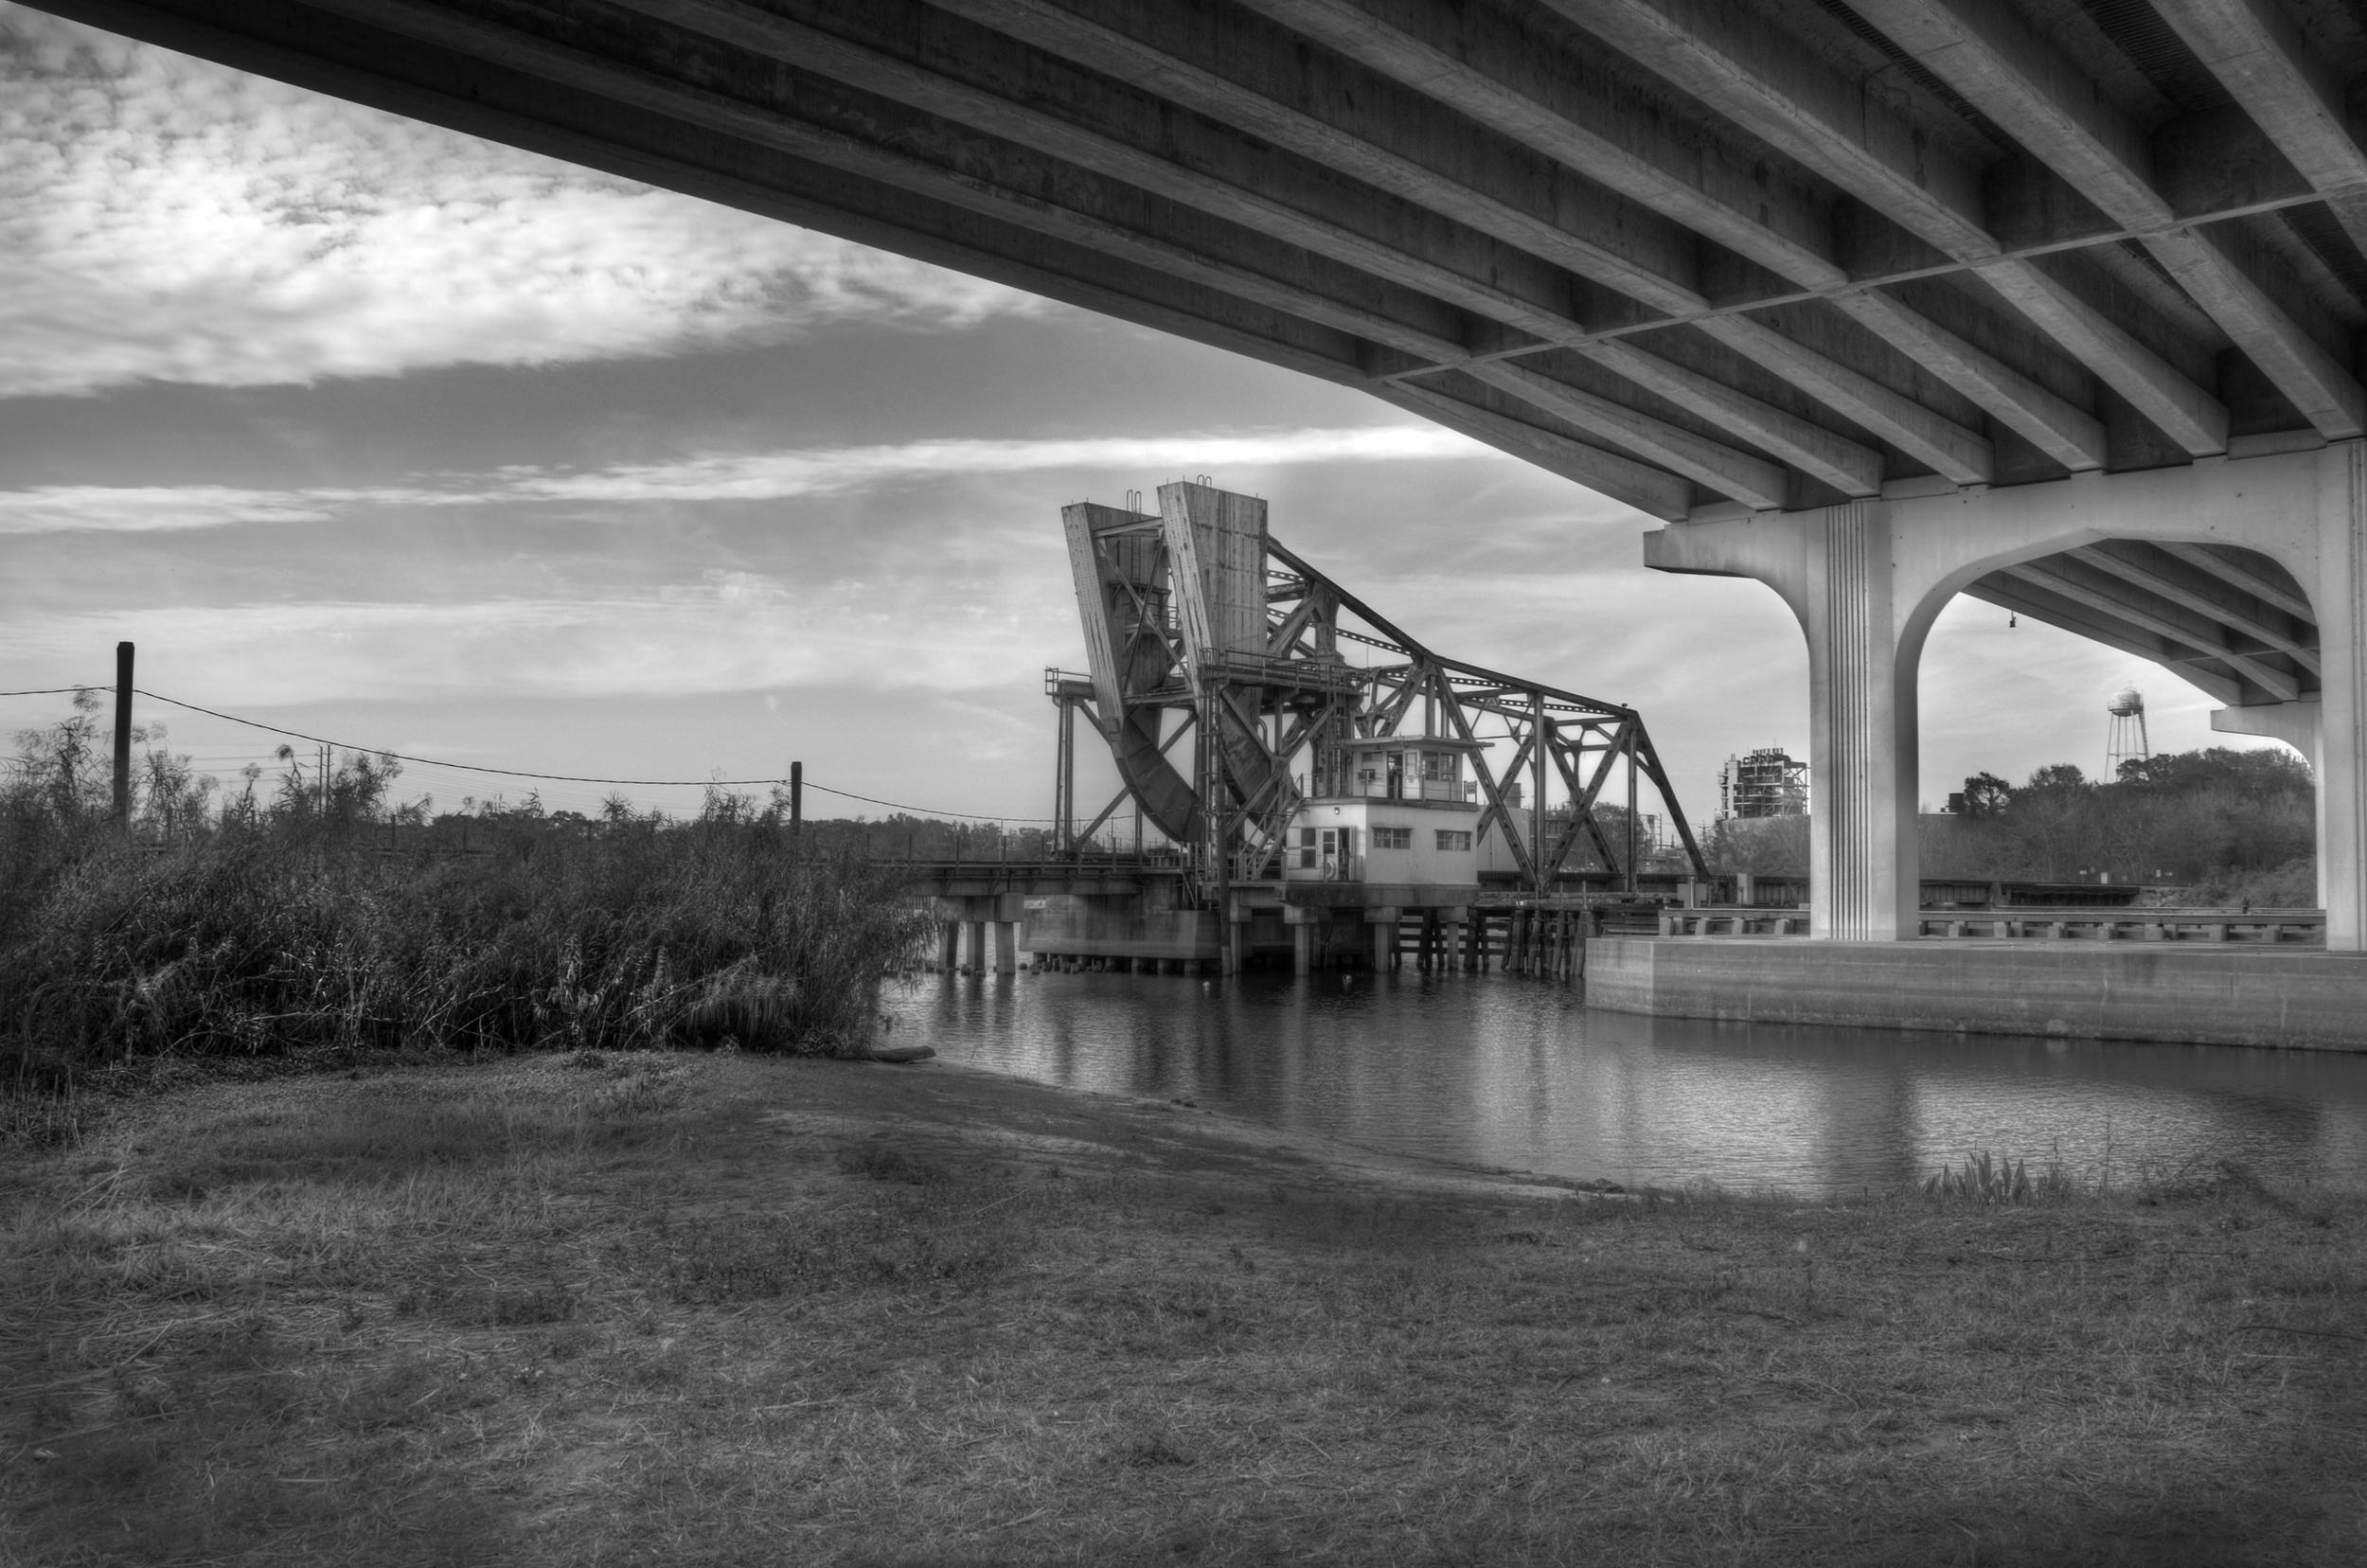 Historic Railroad Counterweight Bridge